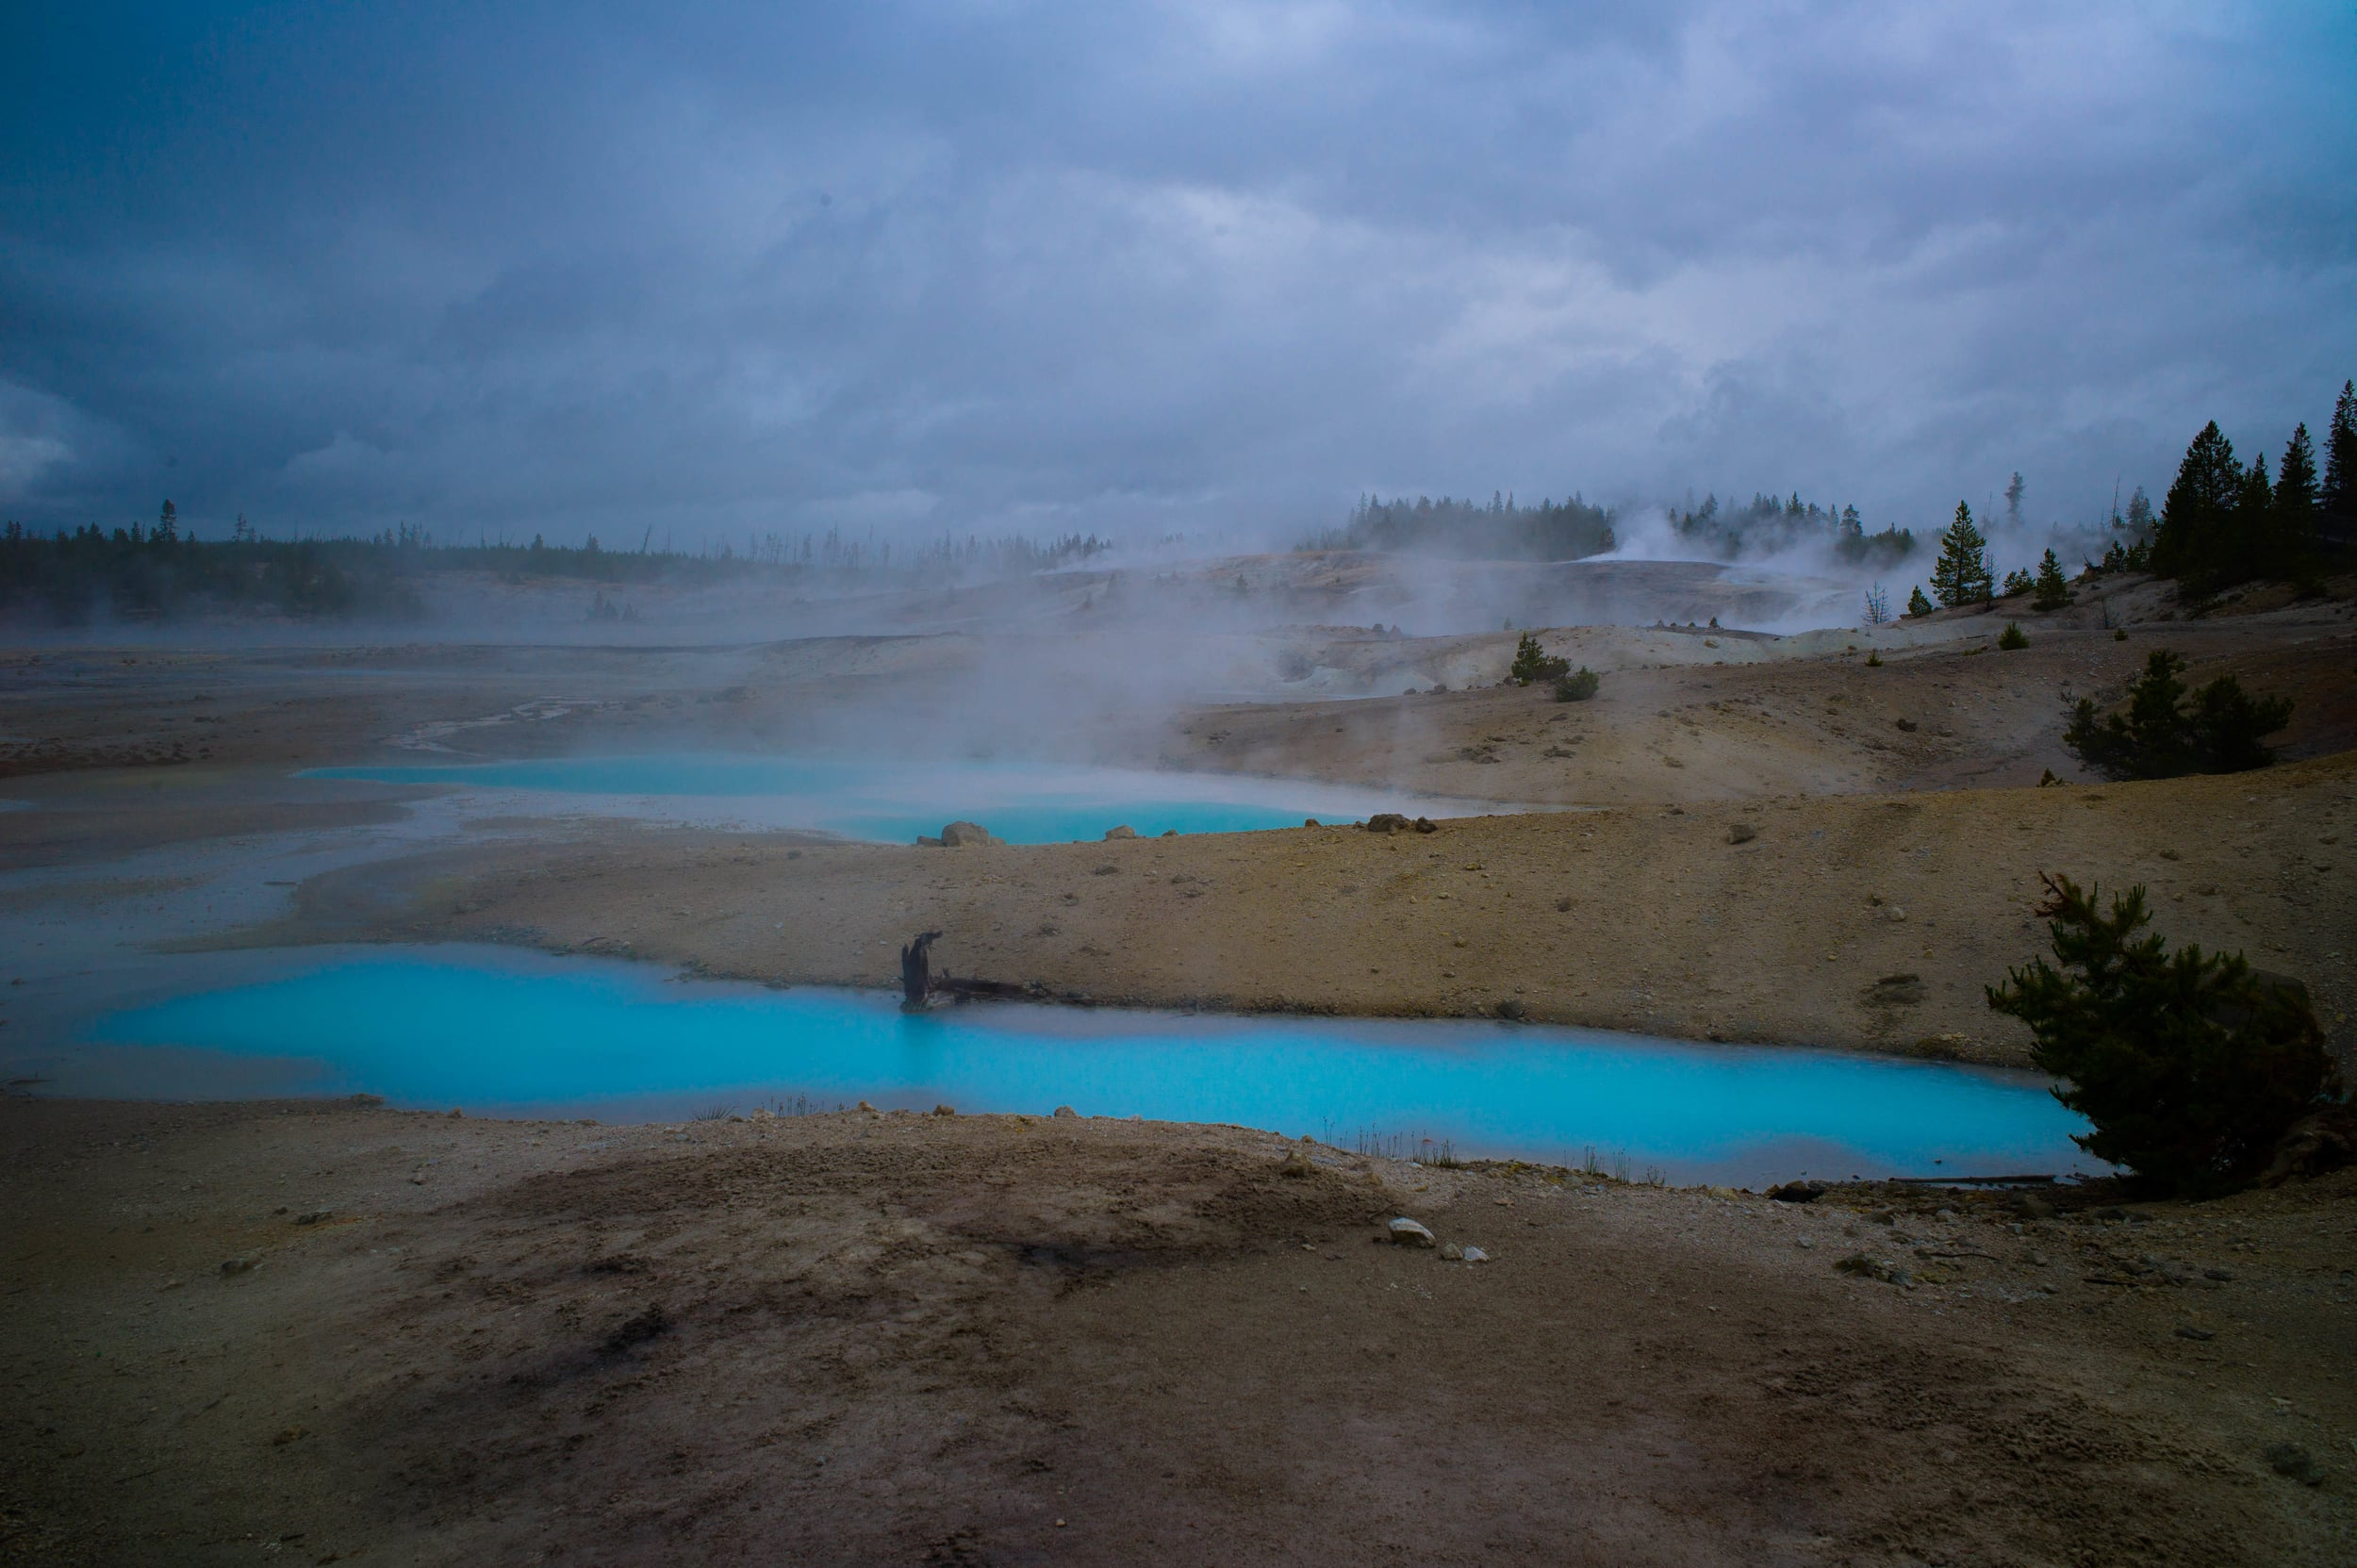 Turquoise Pools